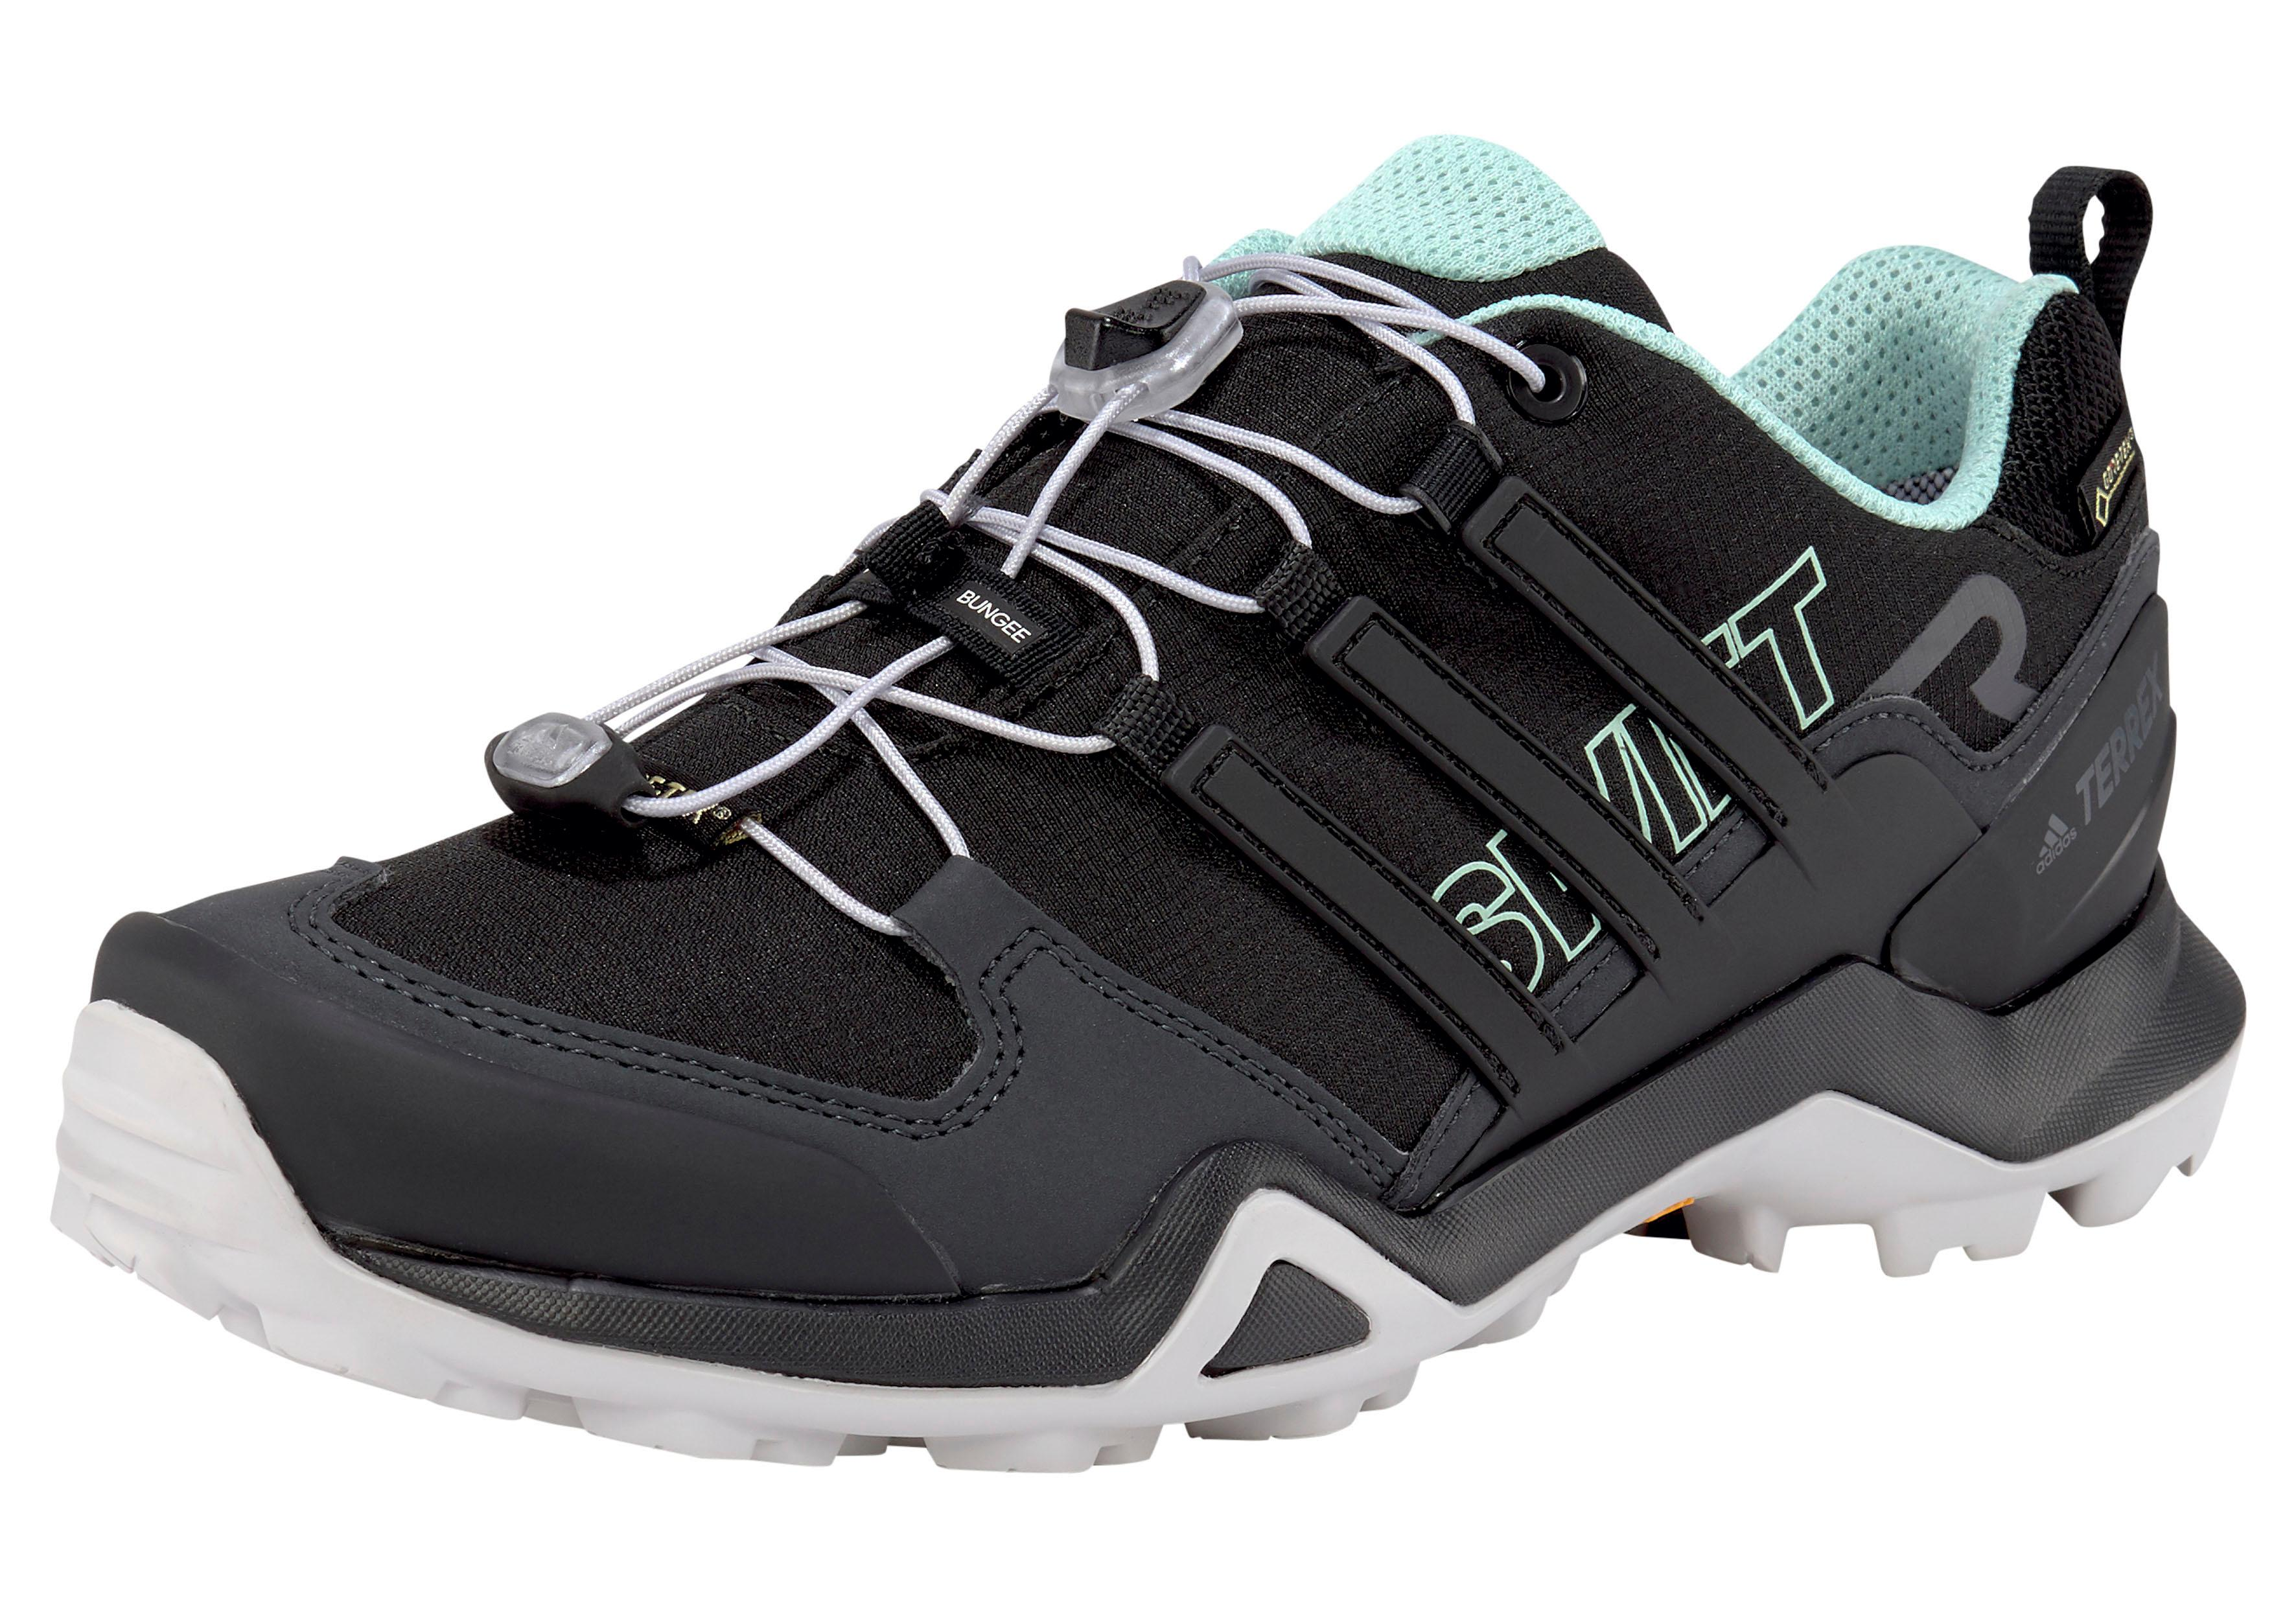 adidas Performance Outdoorschuh Terrex Swft R2 Goretex W